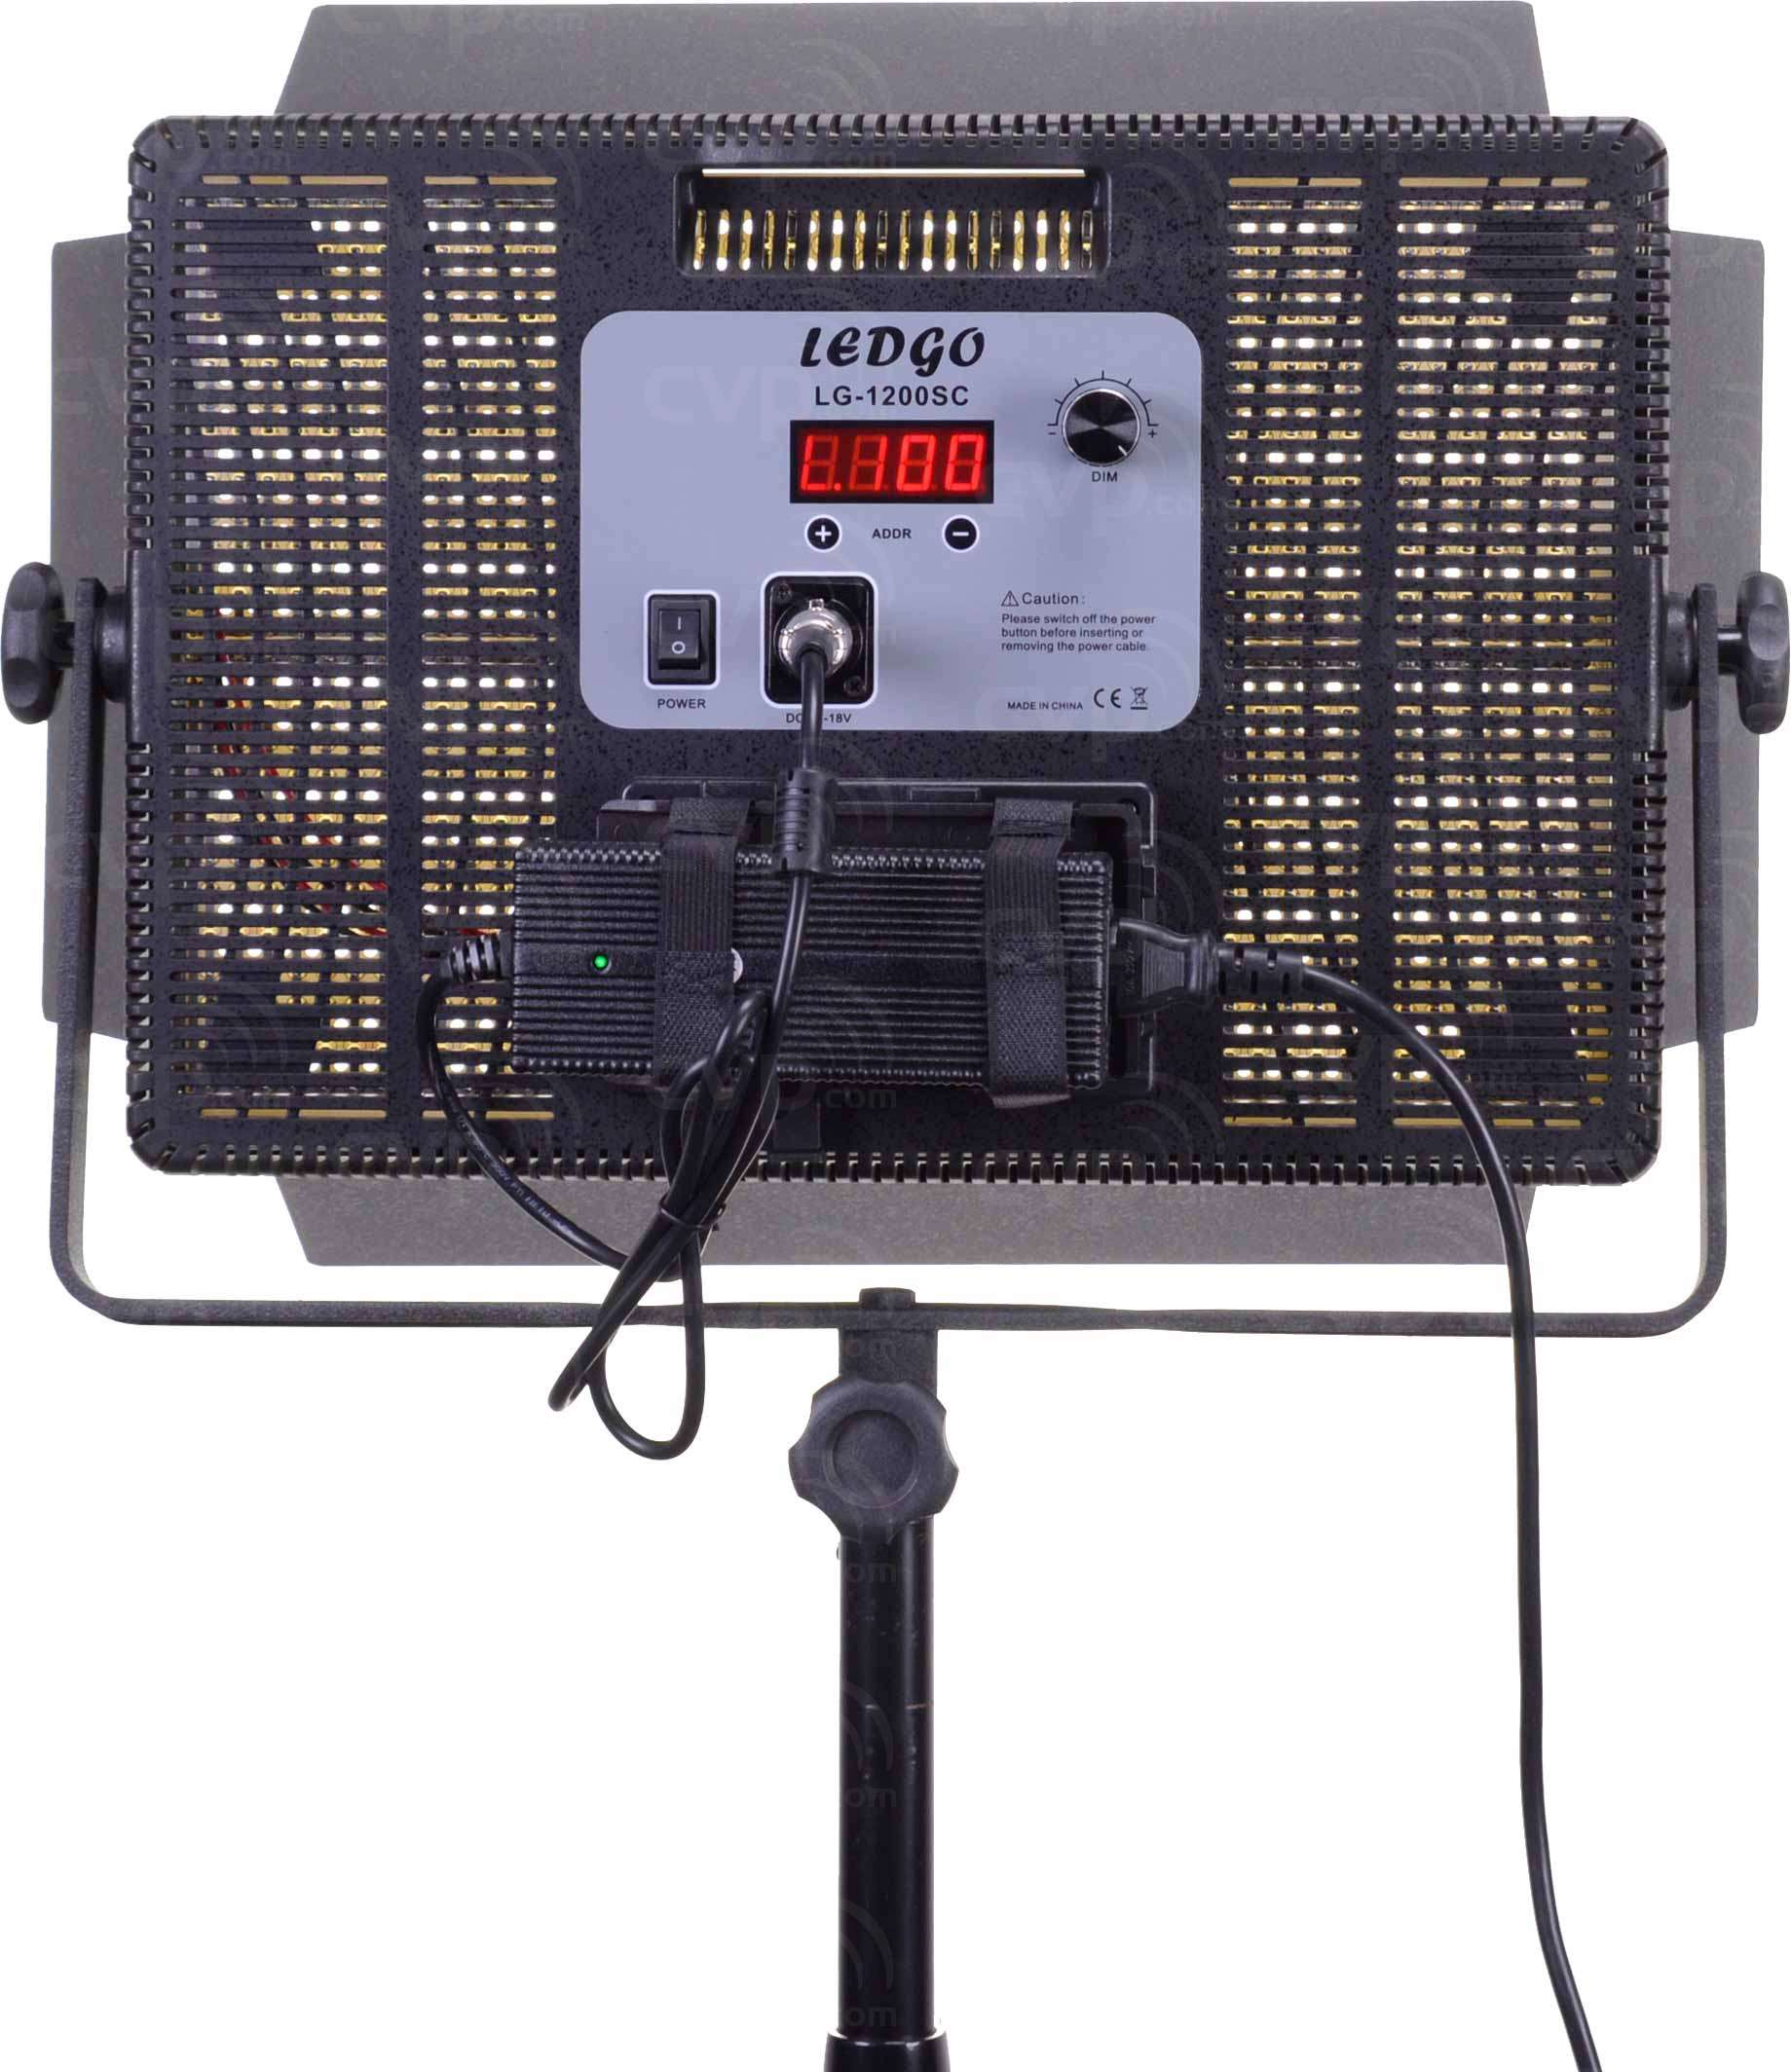 LEDGO LG-1200LK2 Daylight Kit